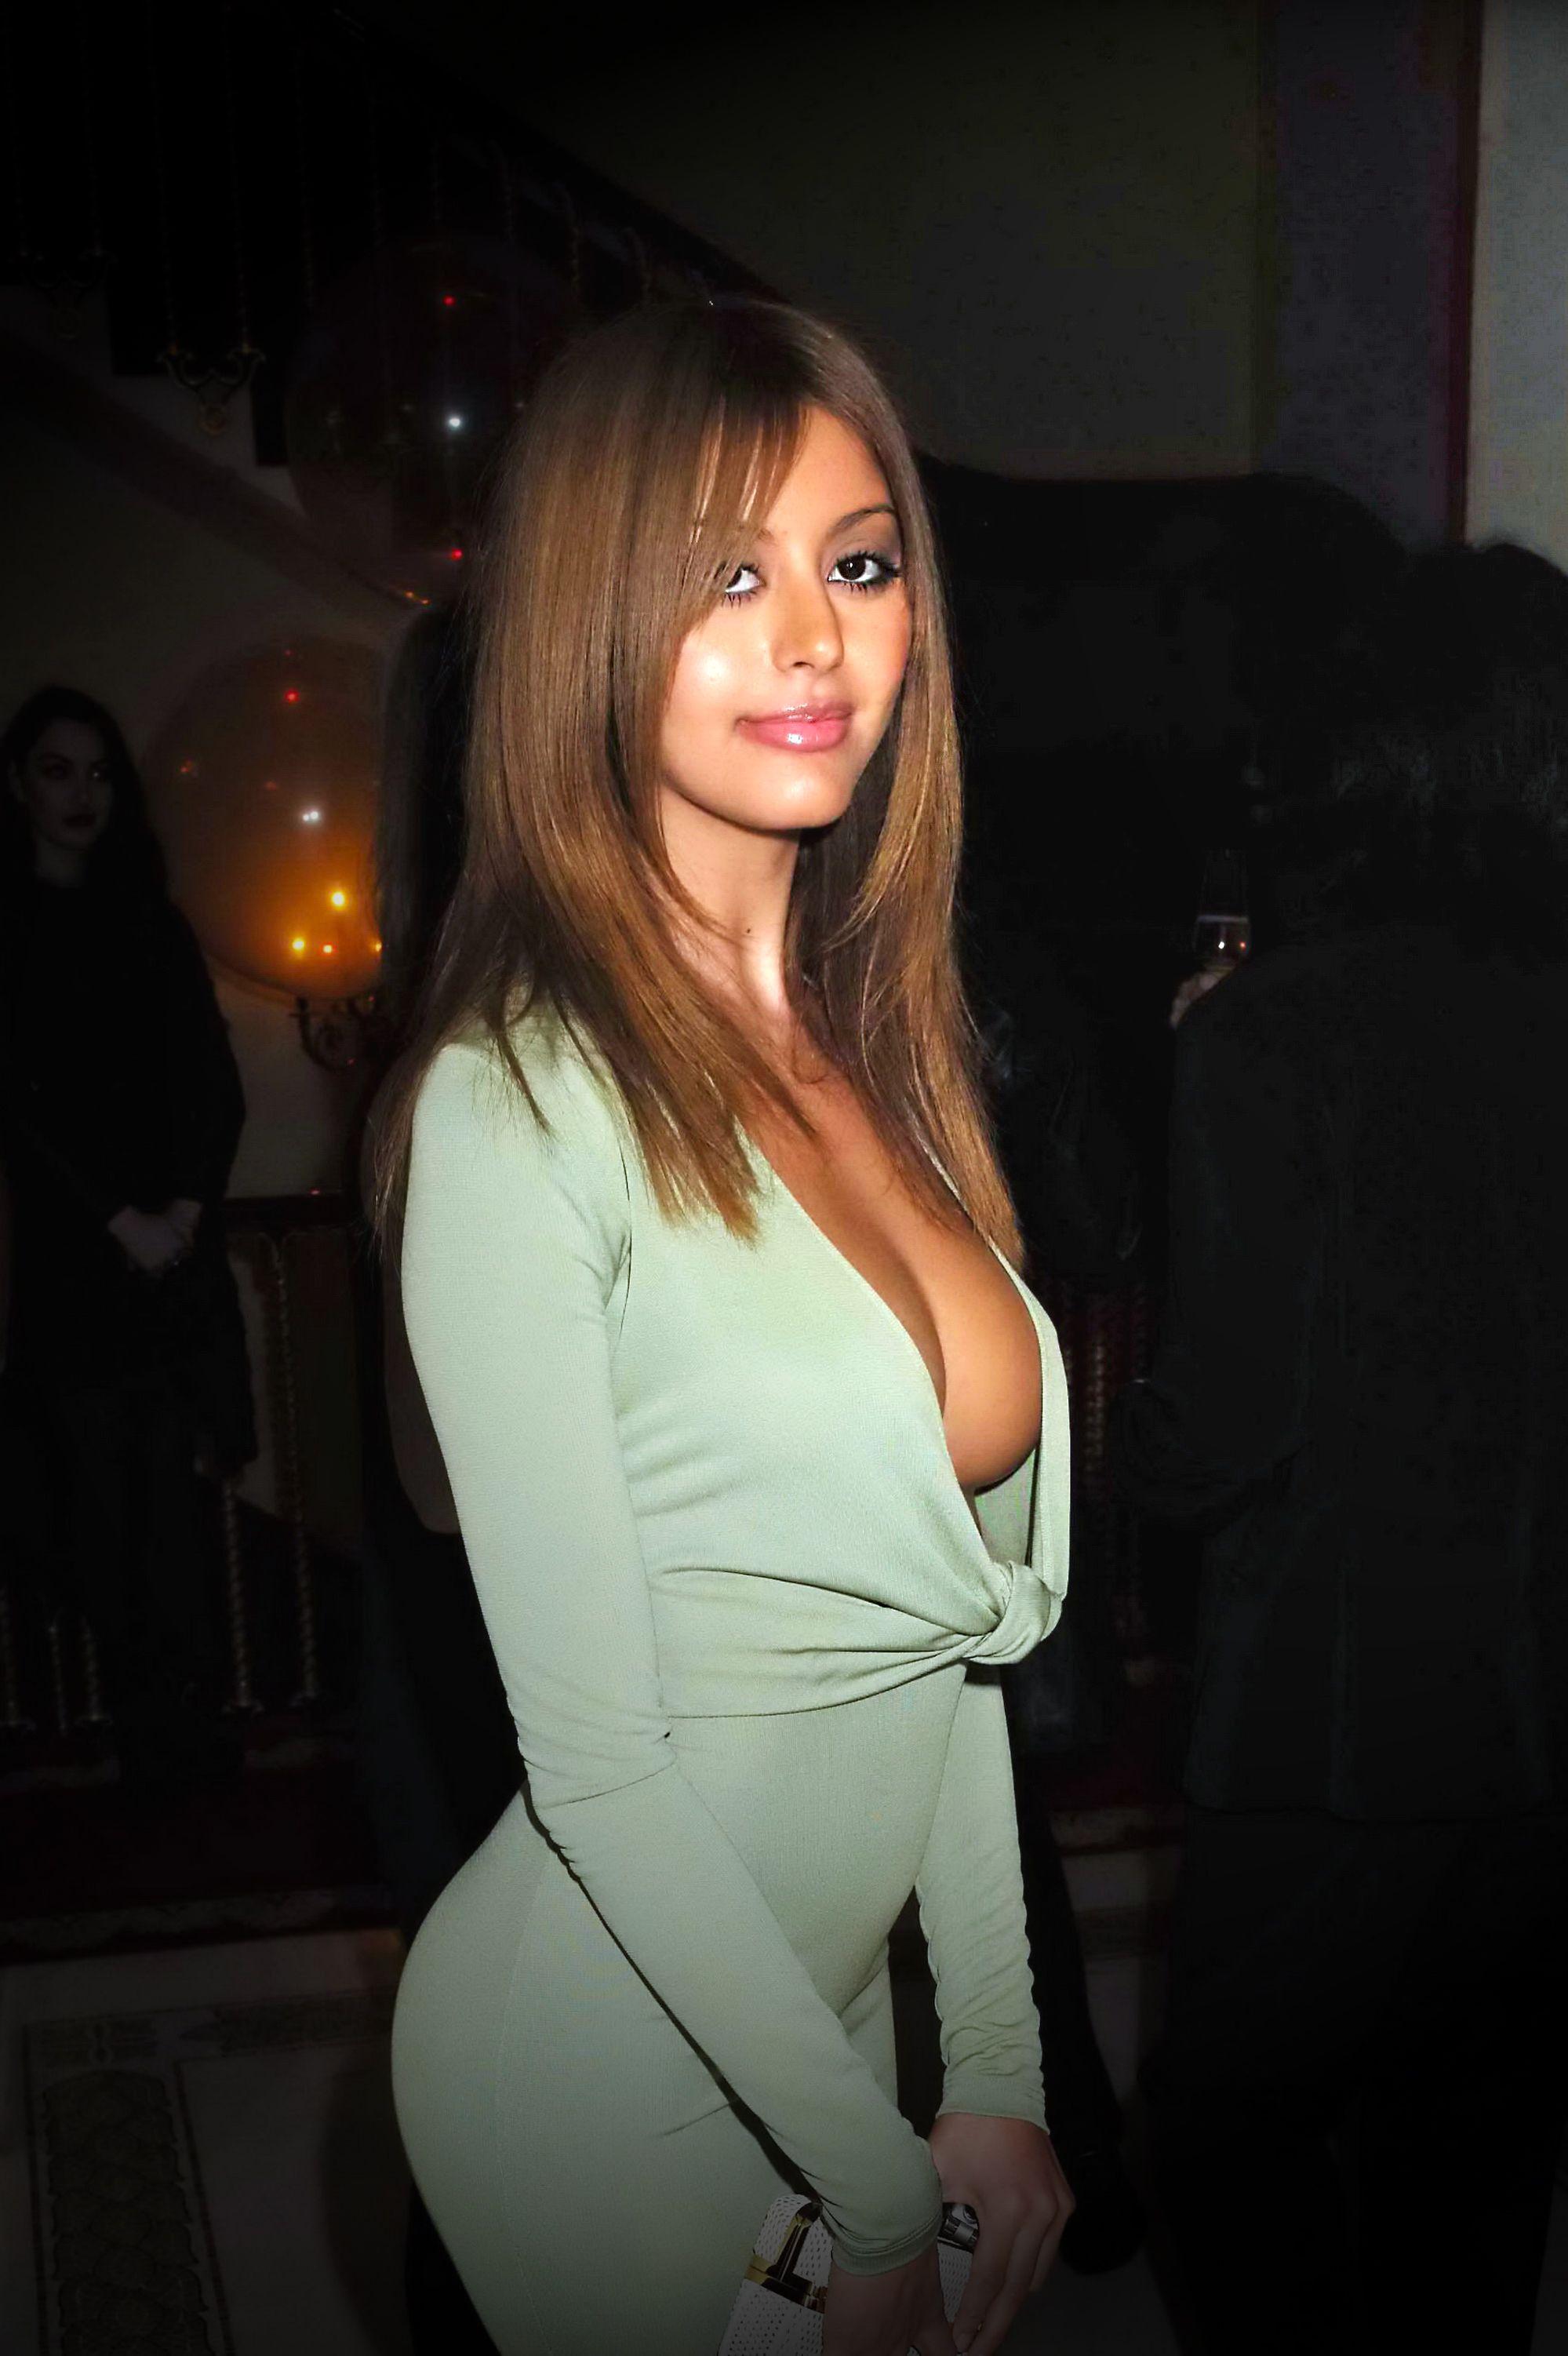 Sexy Pics Of Zahia Dehar